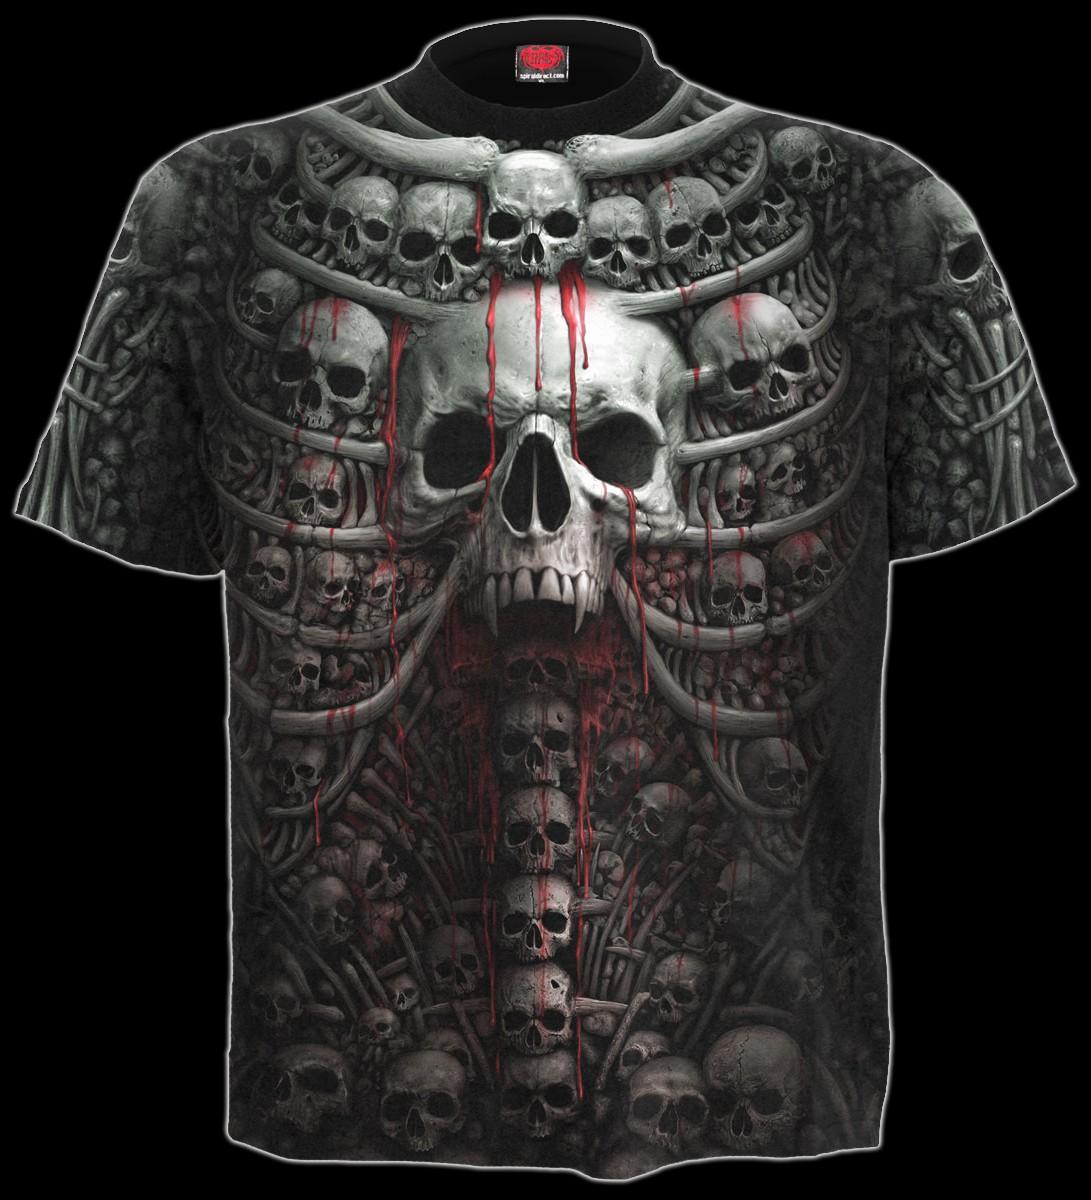 Death Ribs - Skull T-Shirt